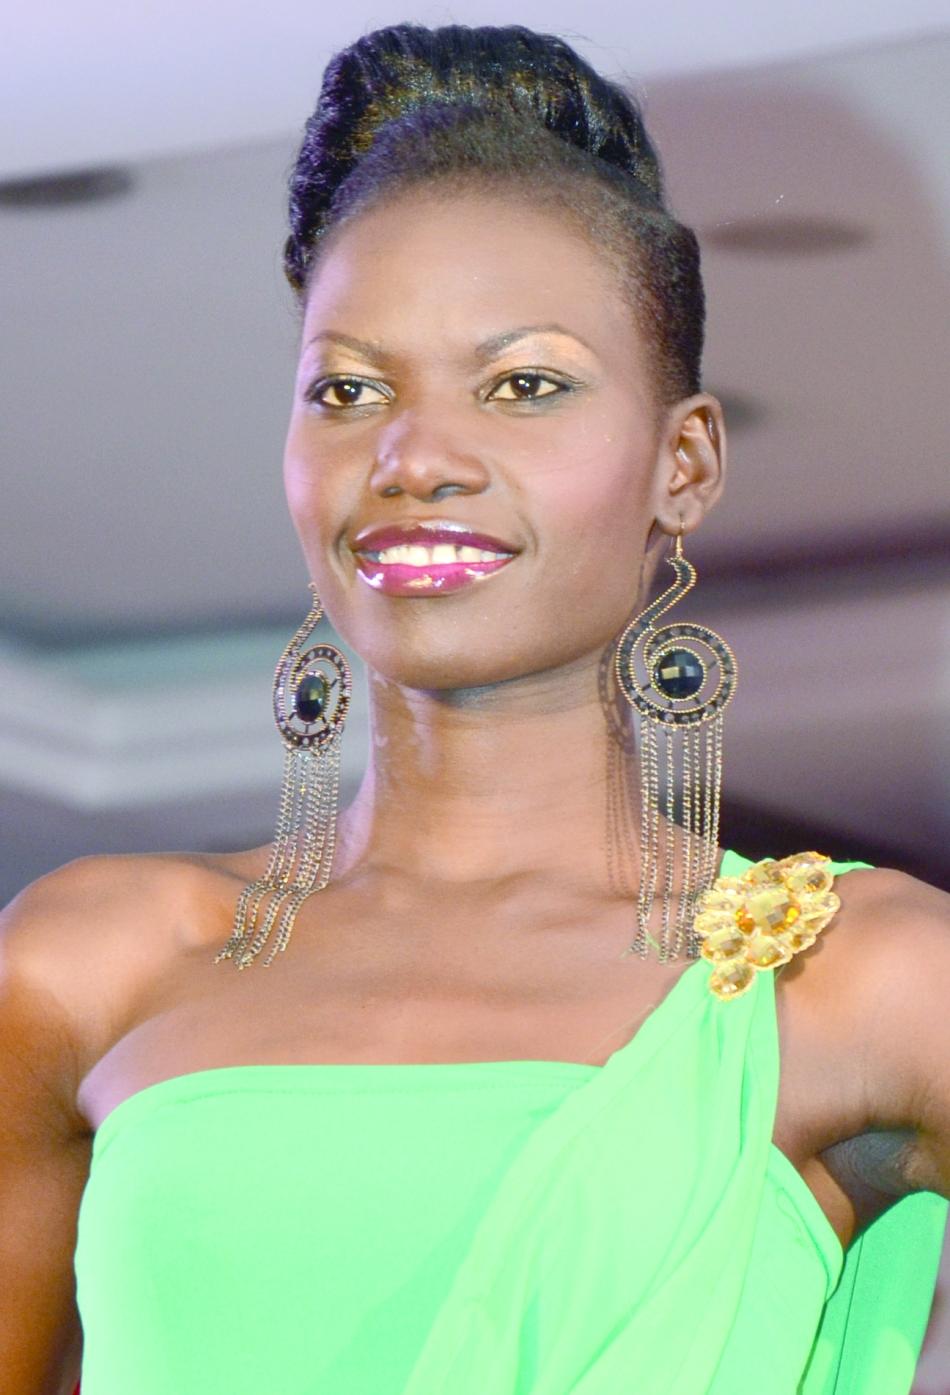 Judith Acayo